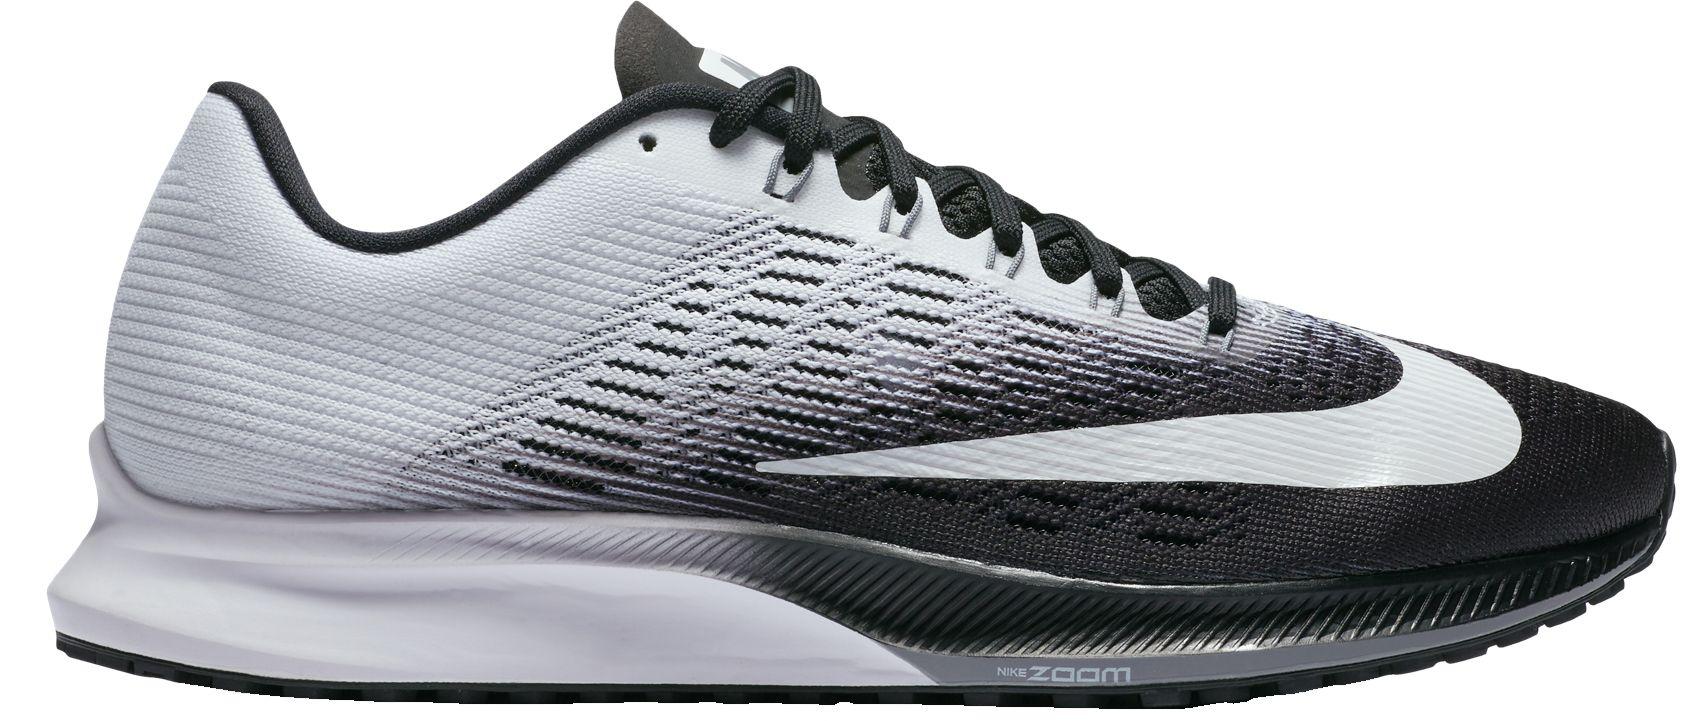 ... product image nike womens zoom elite 9 running shoes. white black white  blue